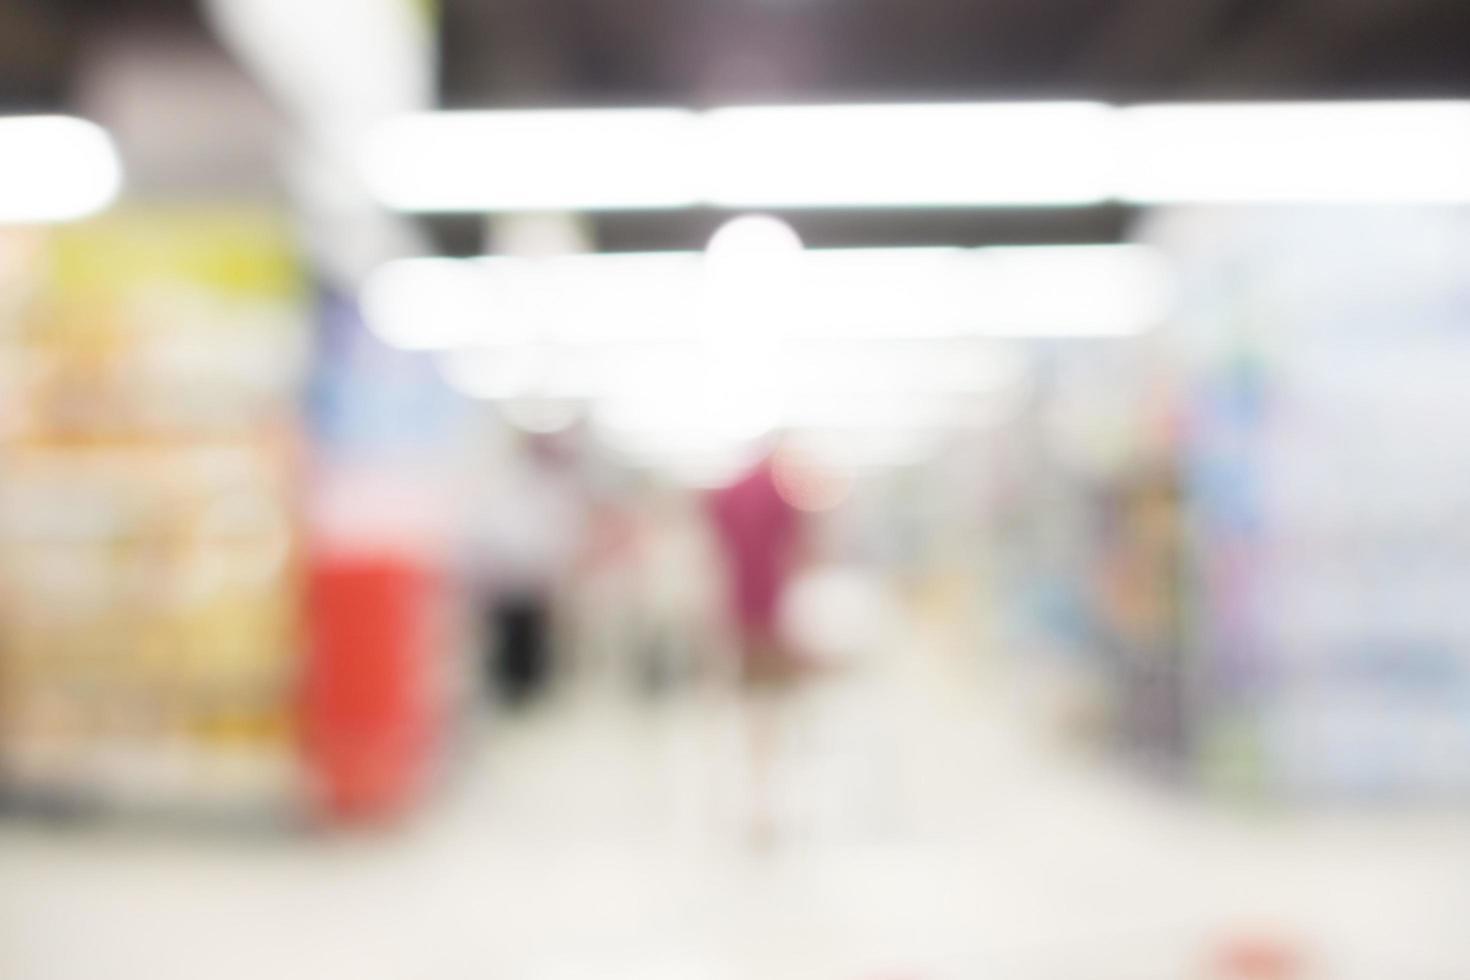 abstract winkelcentrum achtergrond wazig foto